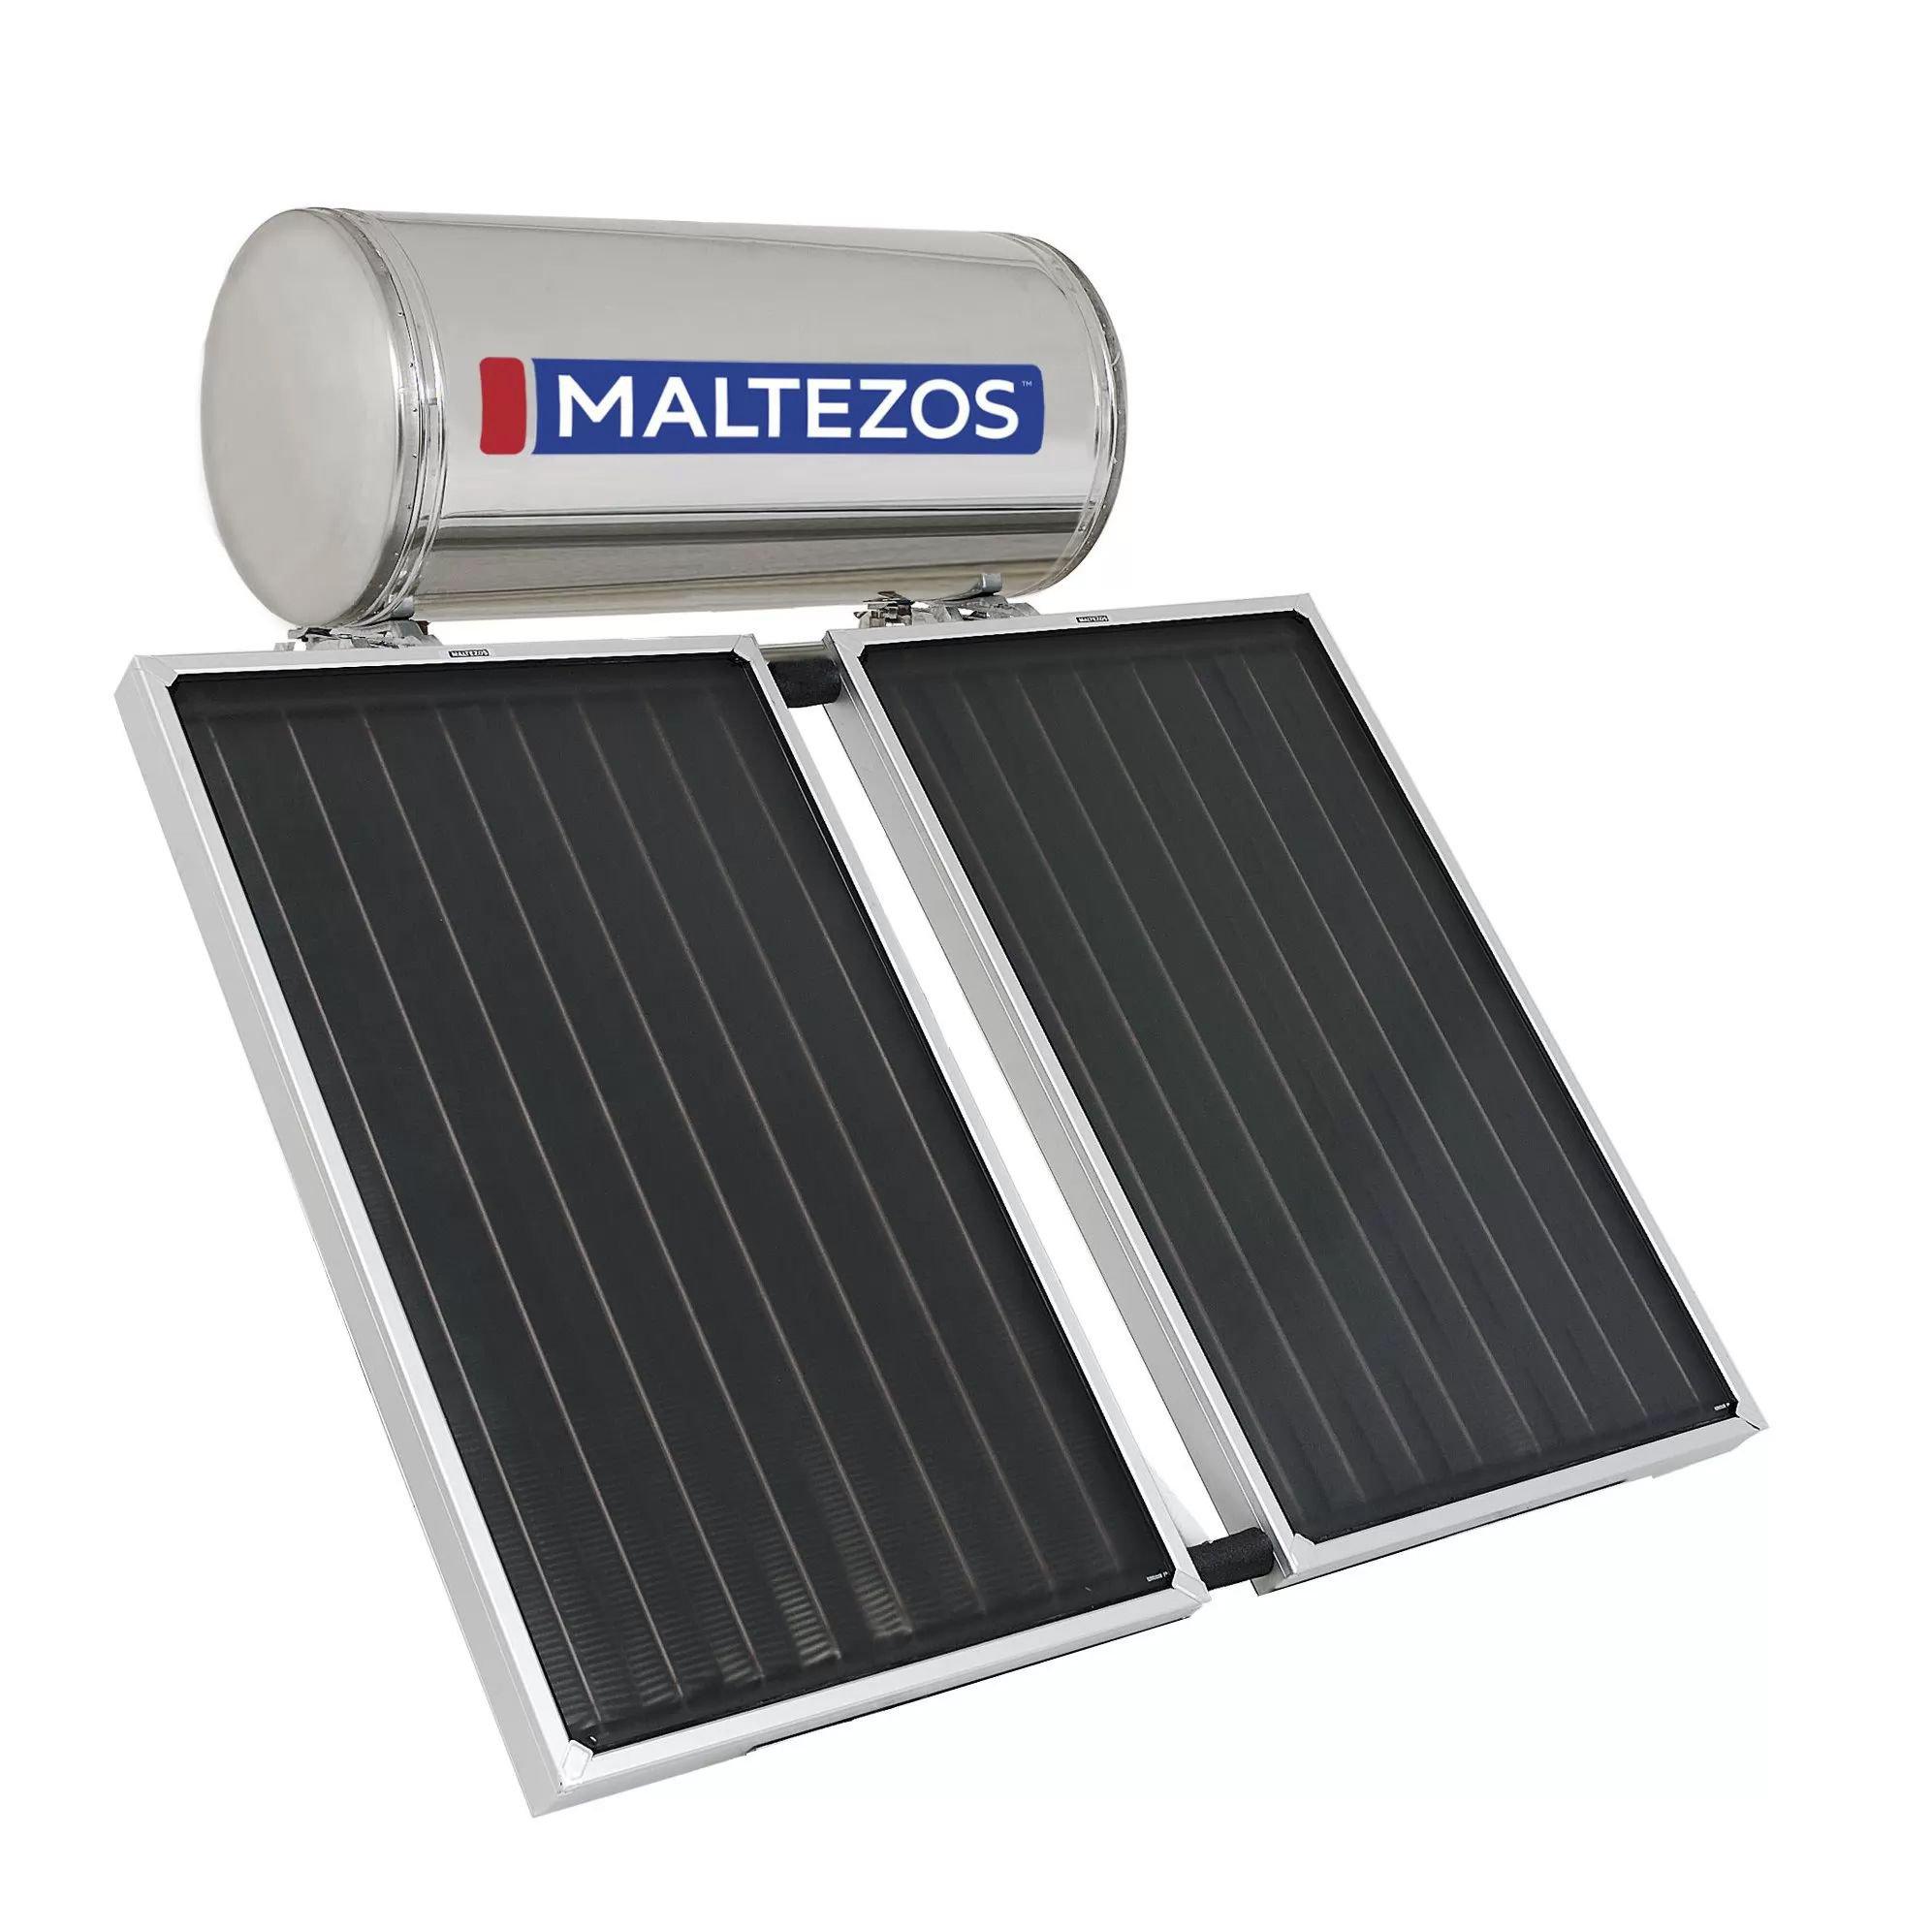 MALTEZOS MALT H 300Lt INOX Τριπλής Ενεργείας 2 Επιλεκτικοί Συλλέκτες 2 SAC 130x150